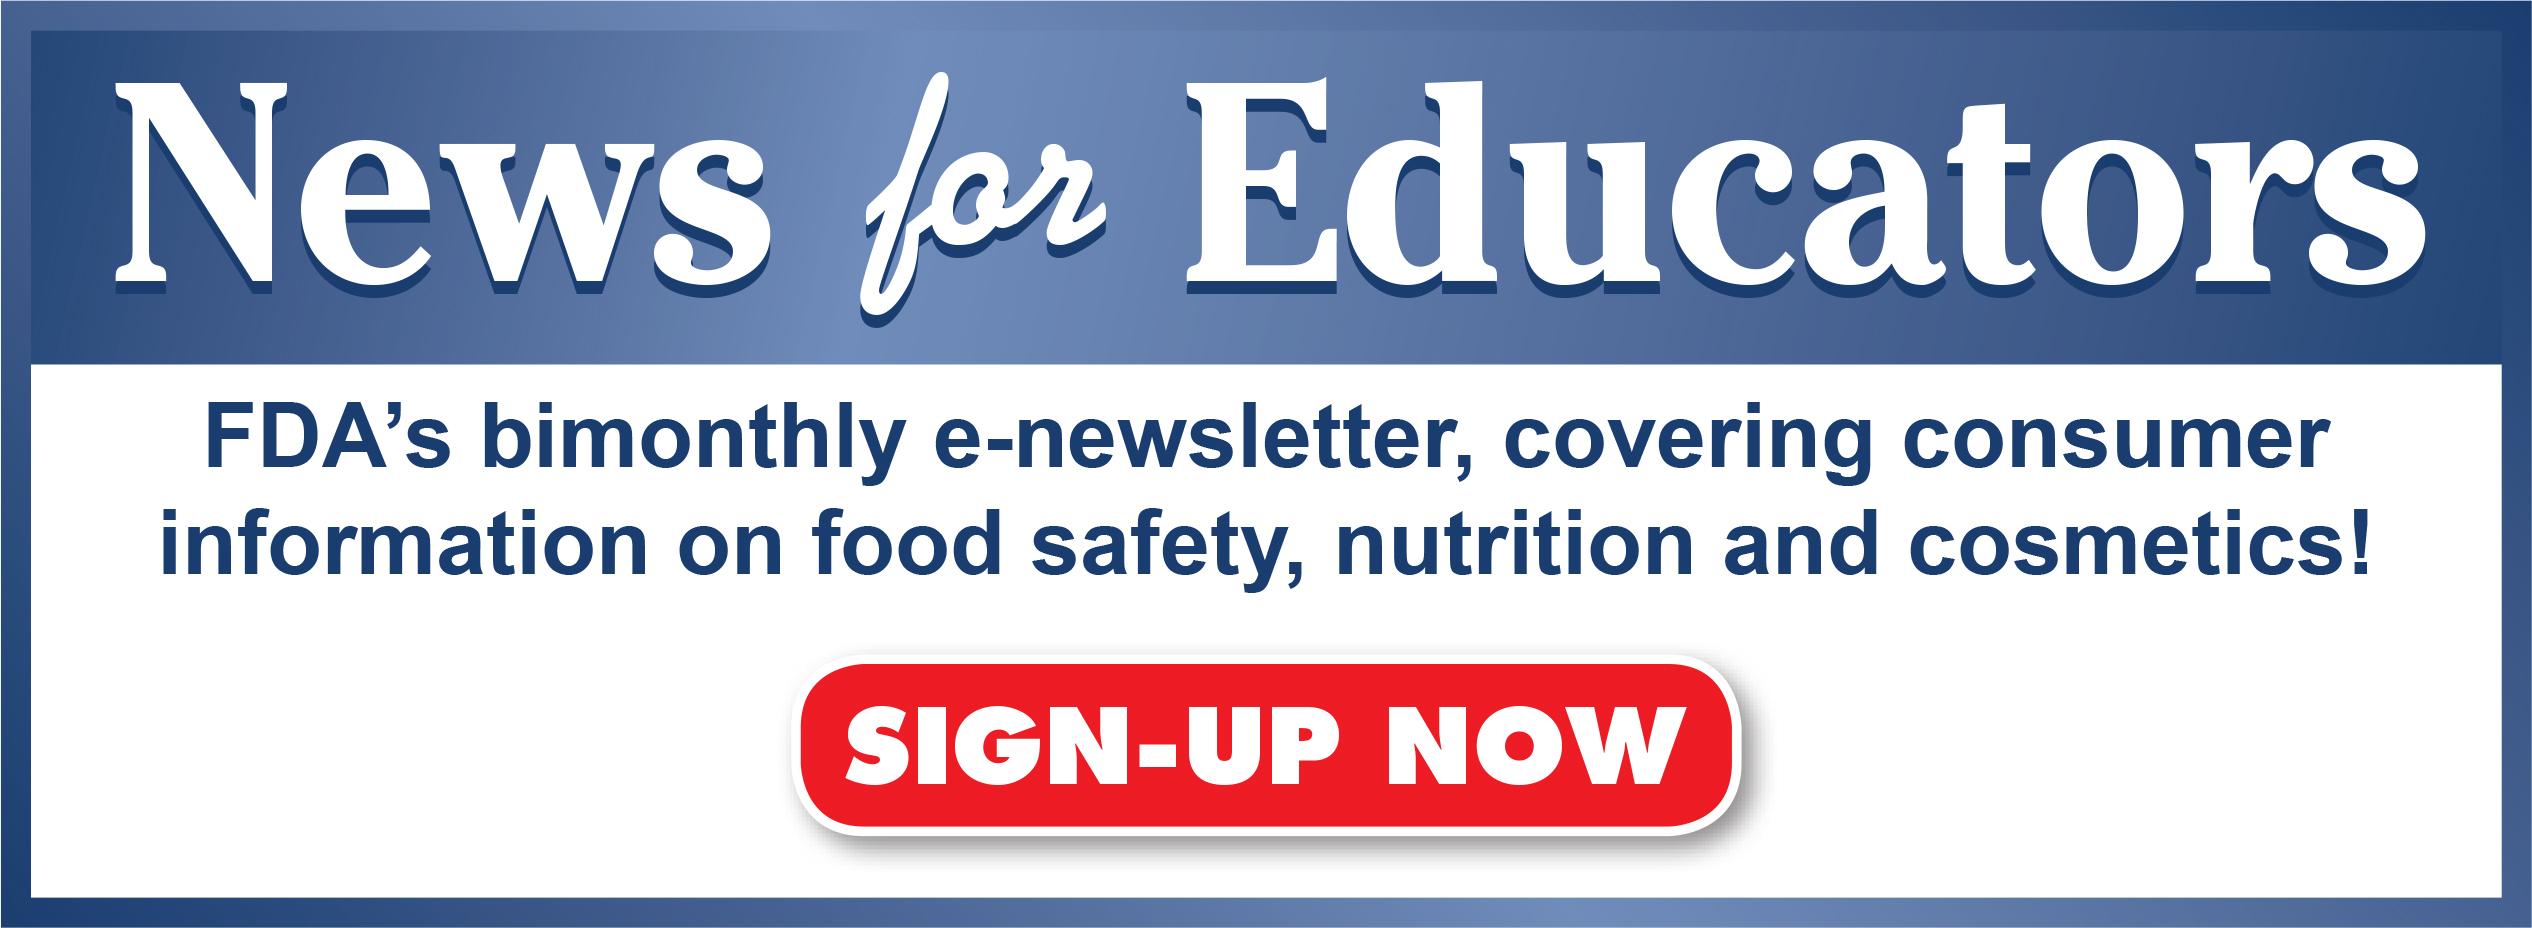 News for Educators